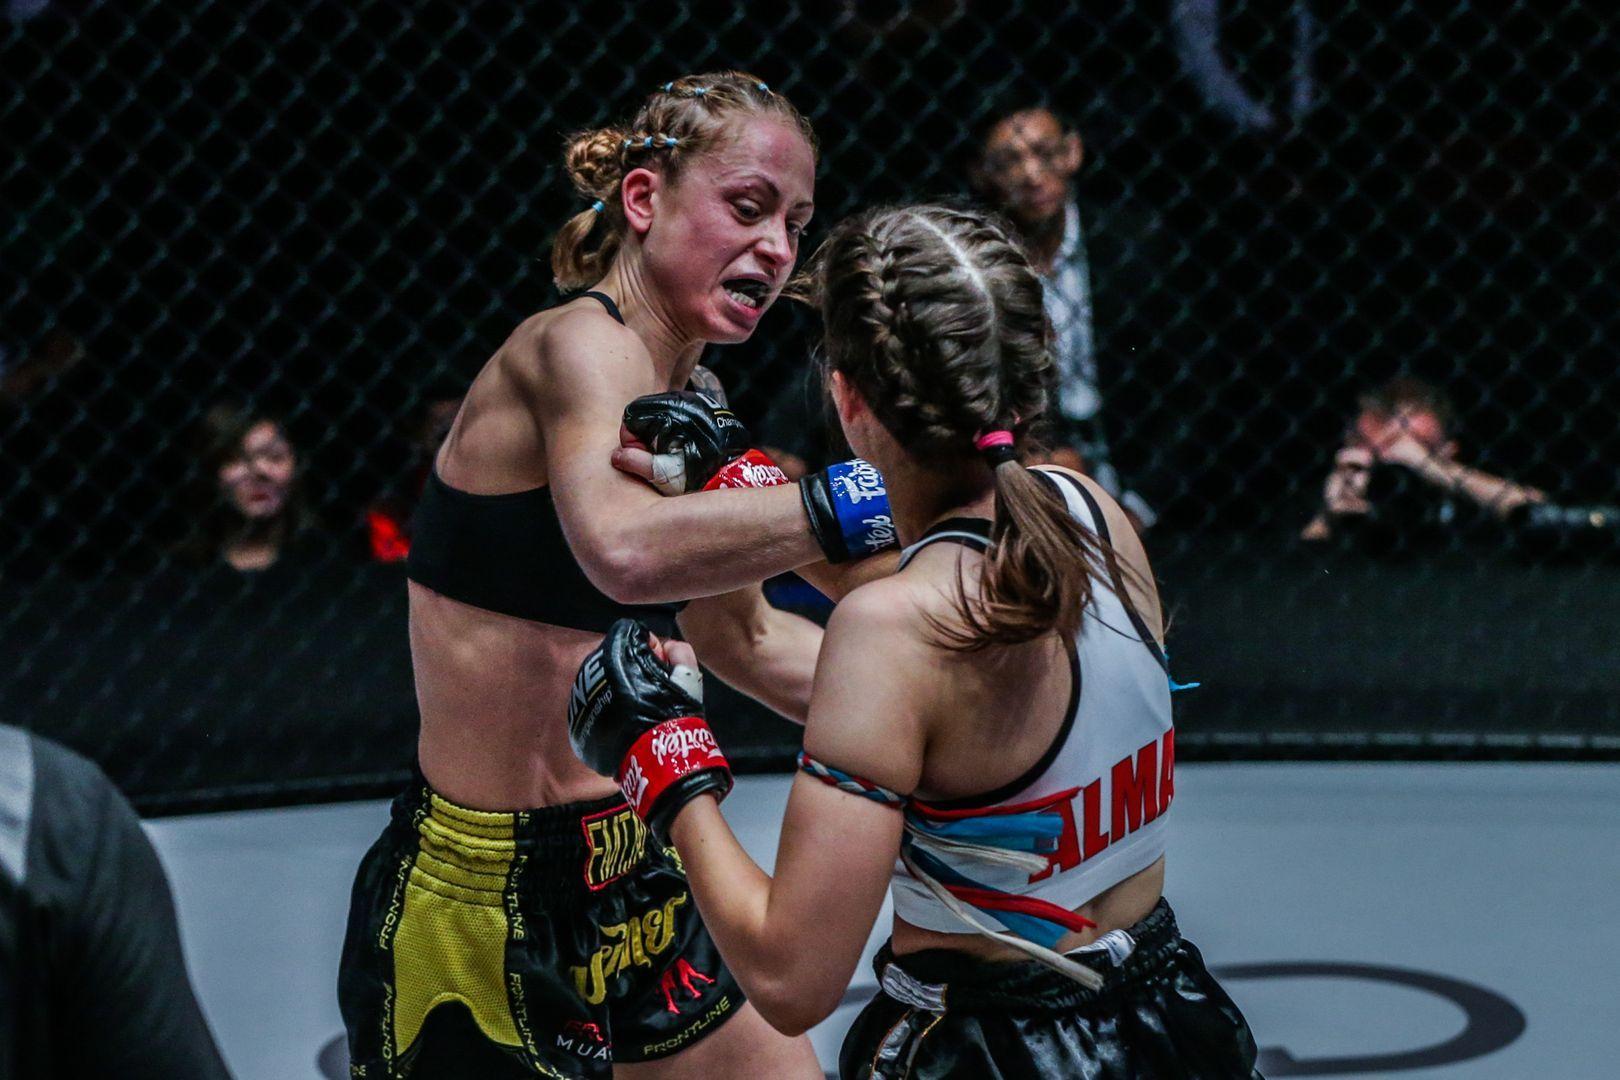 Norway's Anne Line Hogstad faces Australia's Alma Juniku